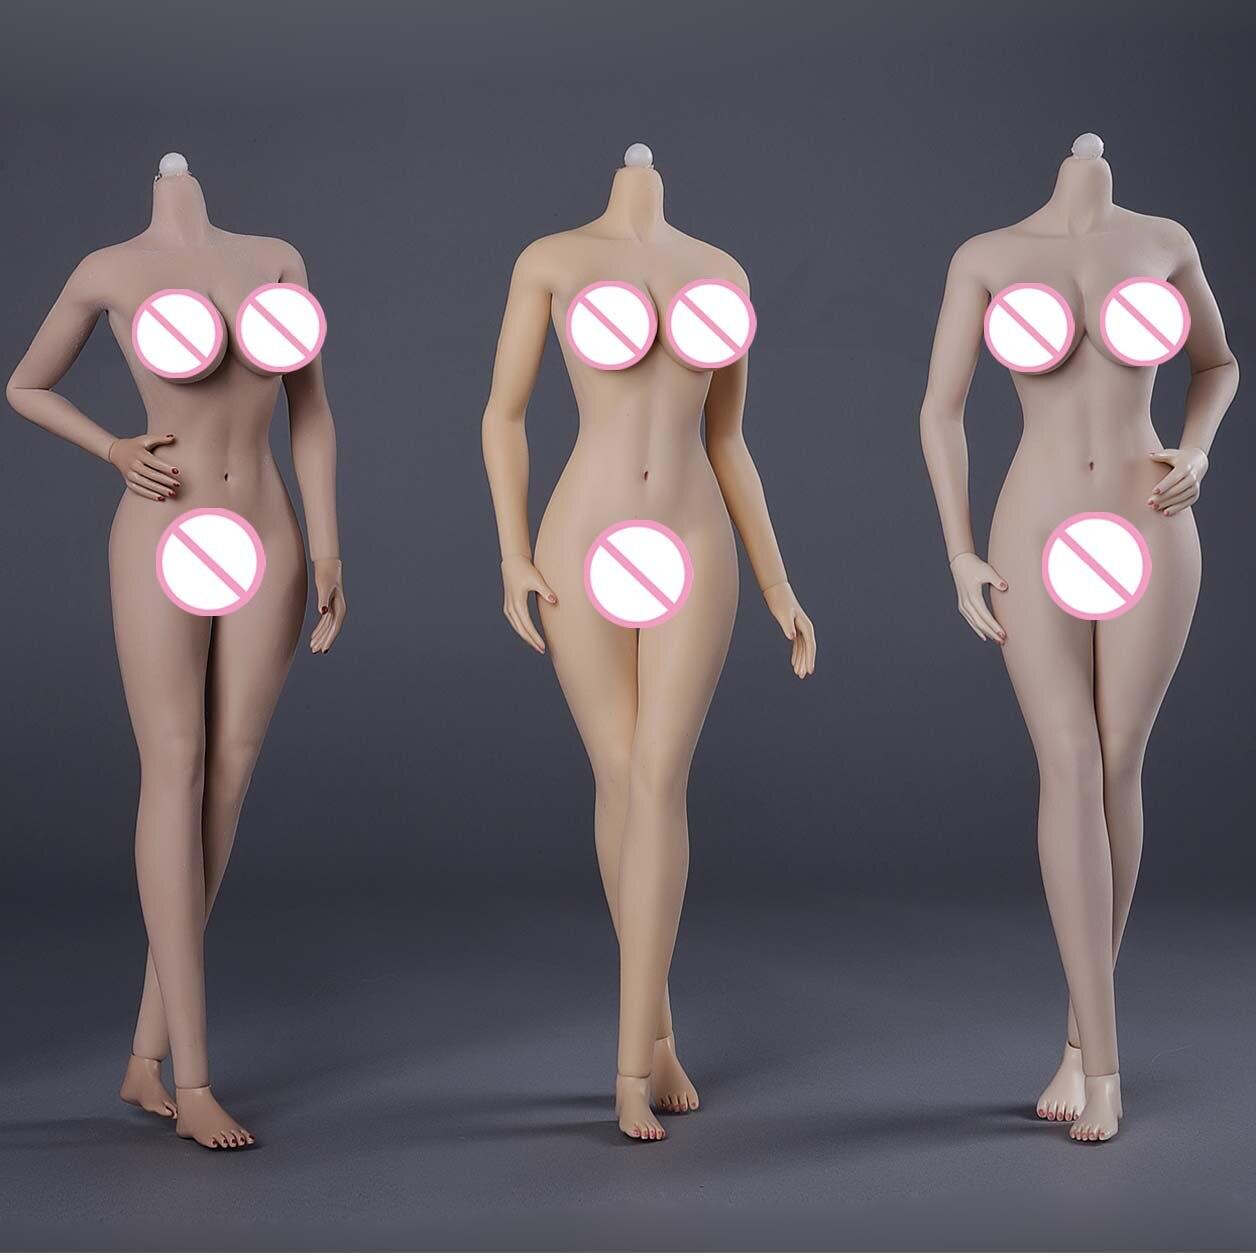 JIAOU PUPPE 3,0 1/6 Scale Figure Super Flexible Europäischen Form (Große büste) weibliche Nahtlose Körper POM Skeleton JIAOUDOLL Körper